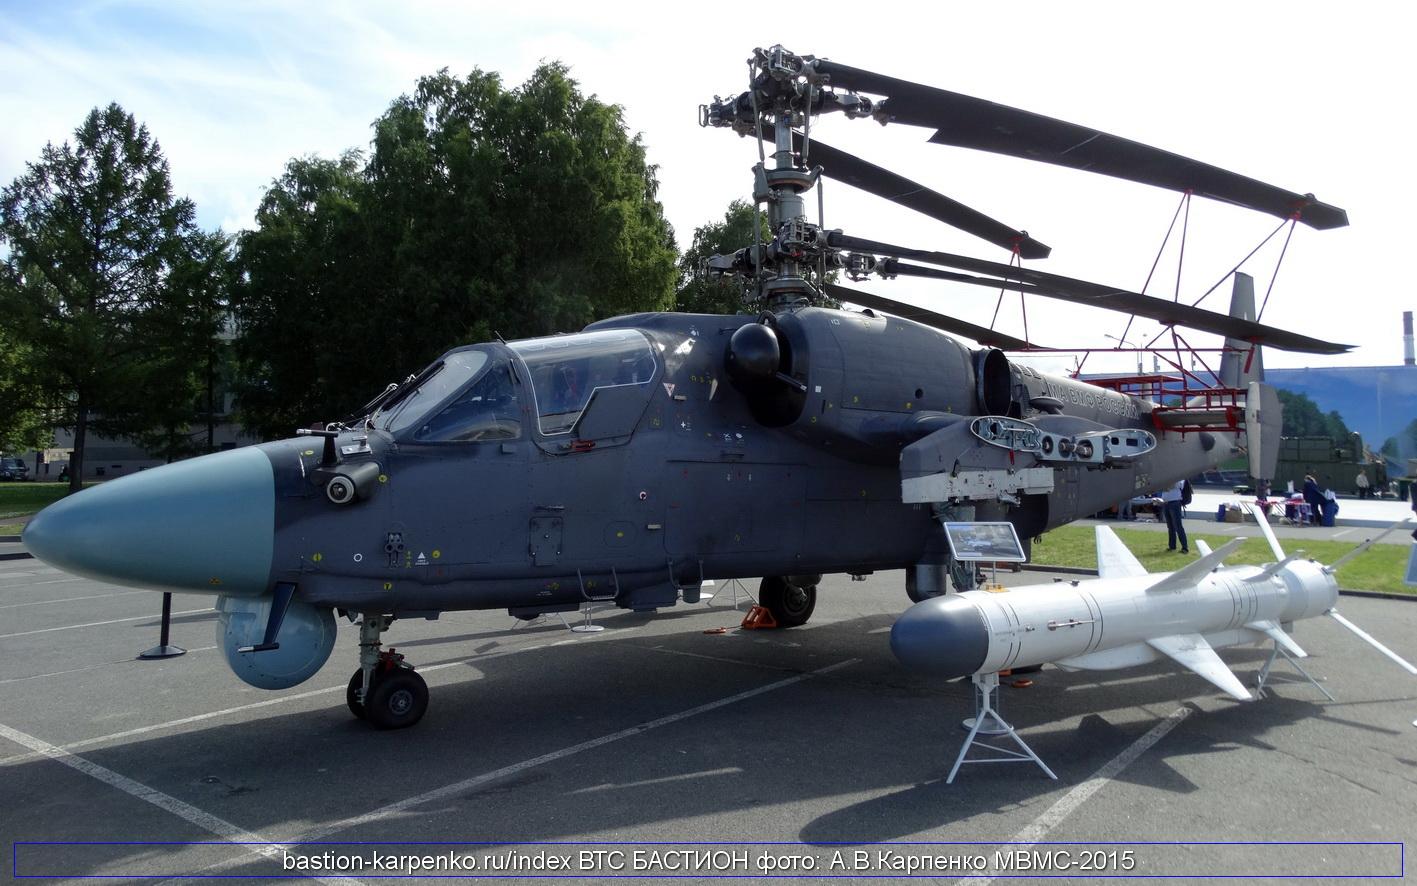 Ka-52K for Russian Navy - Page 2 KA-52K_MVMS-2015_02